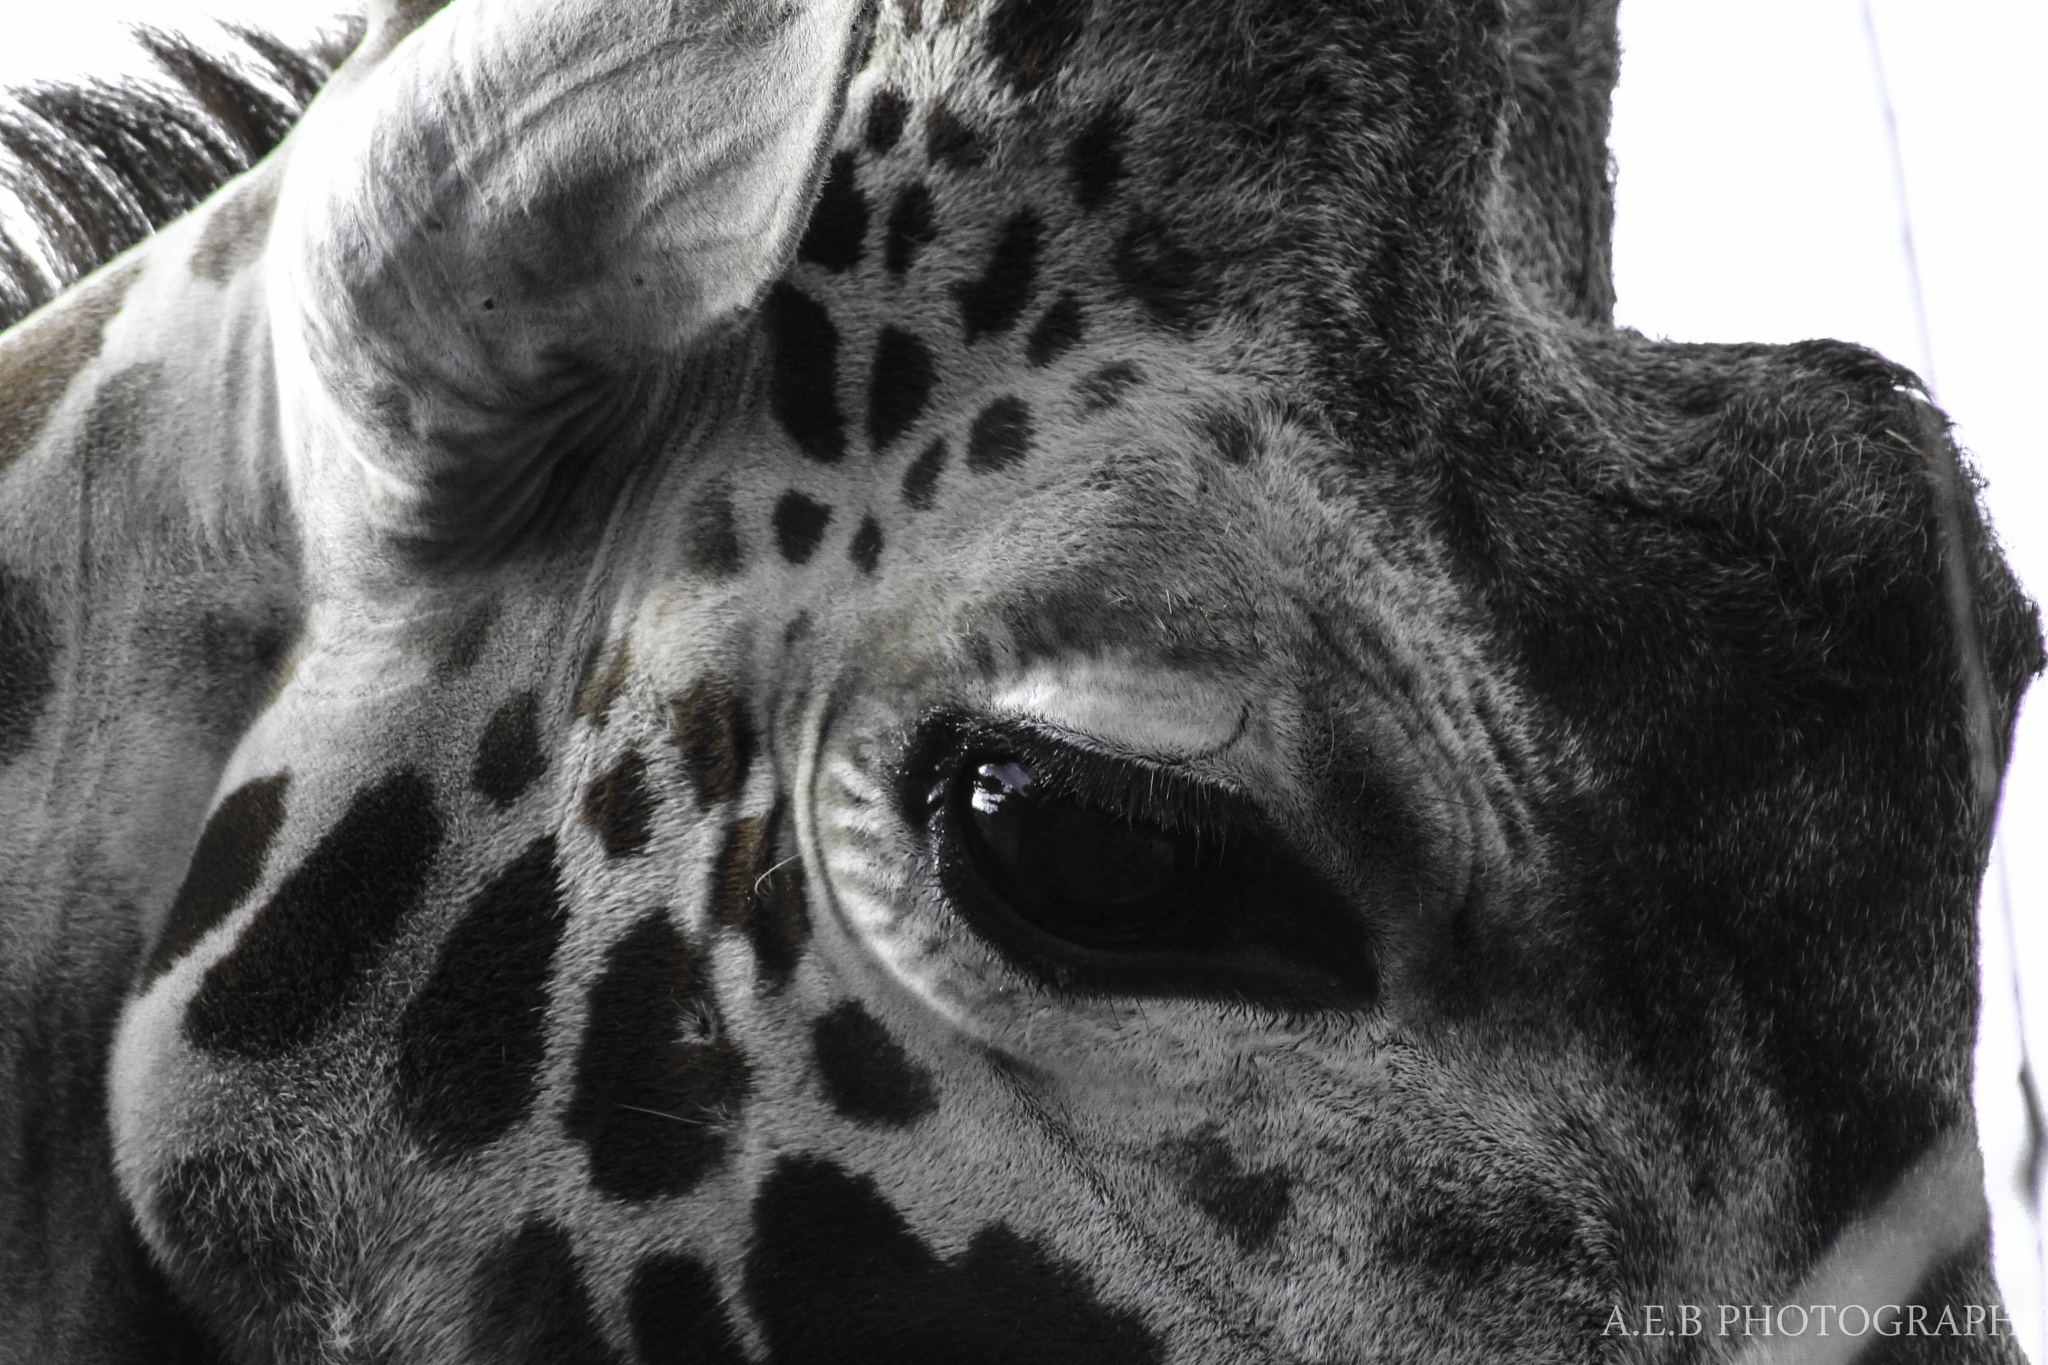 Giraffe by Annice Bridgett